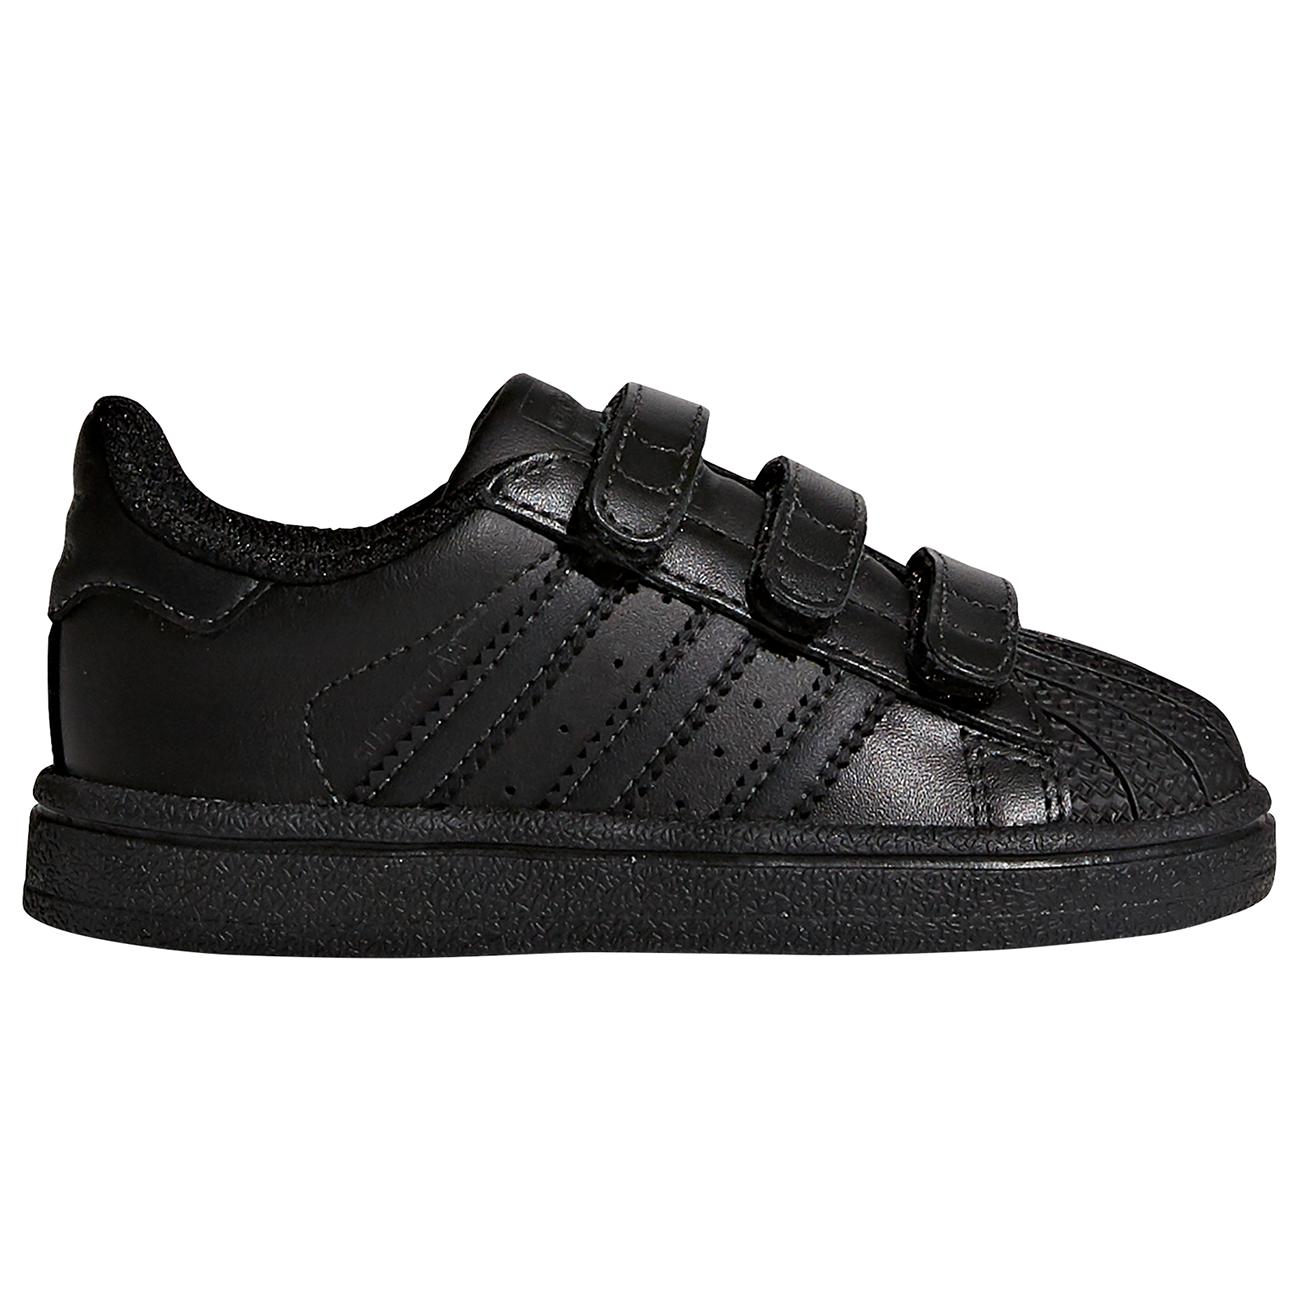 adidas superstar black new york, Adidas danmark adidas